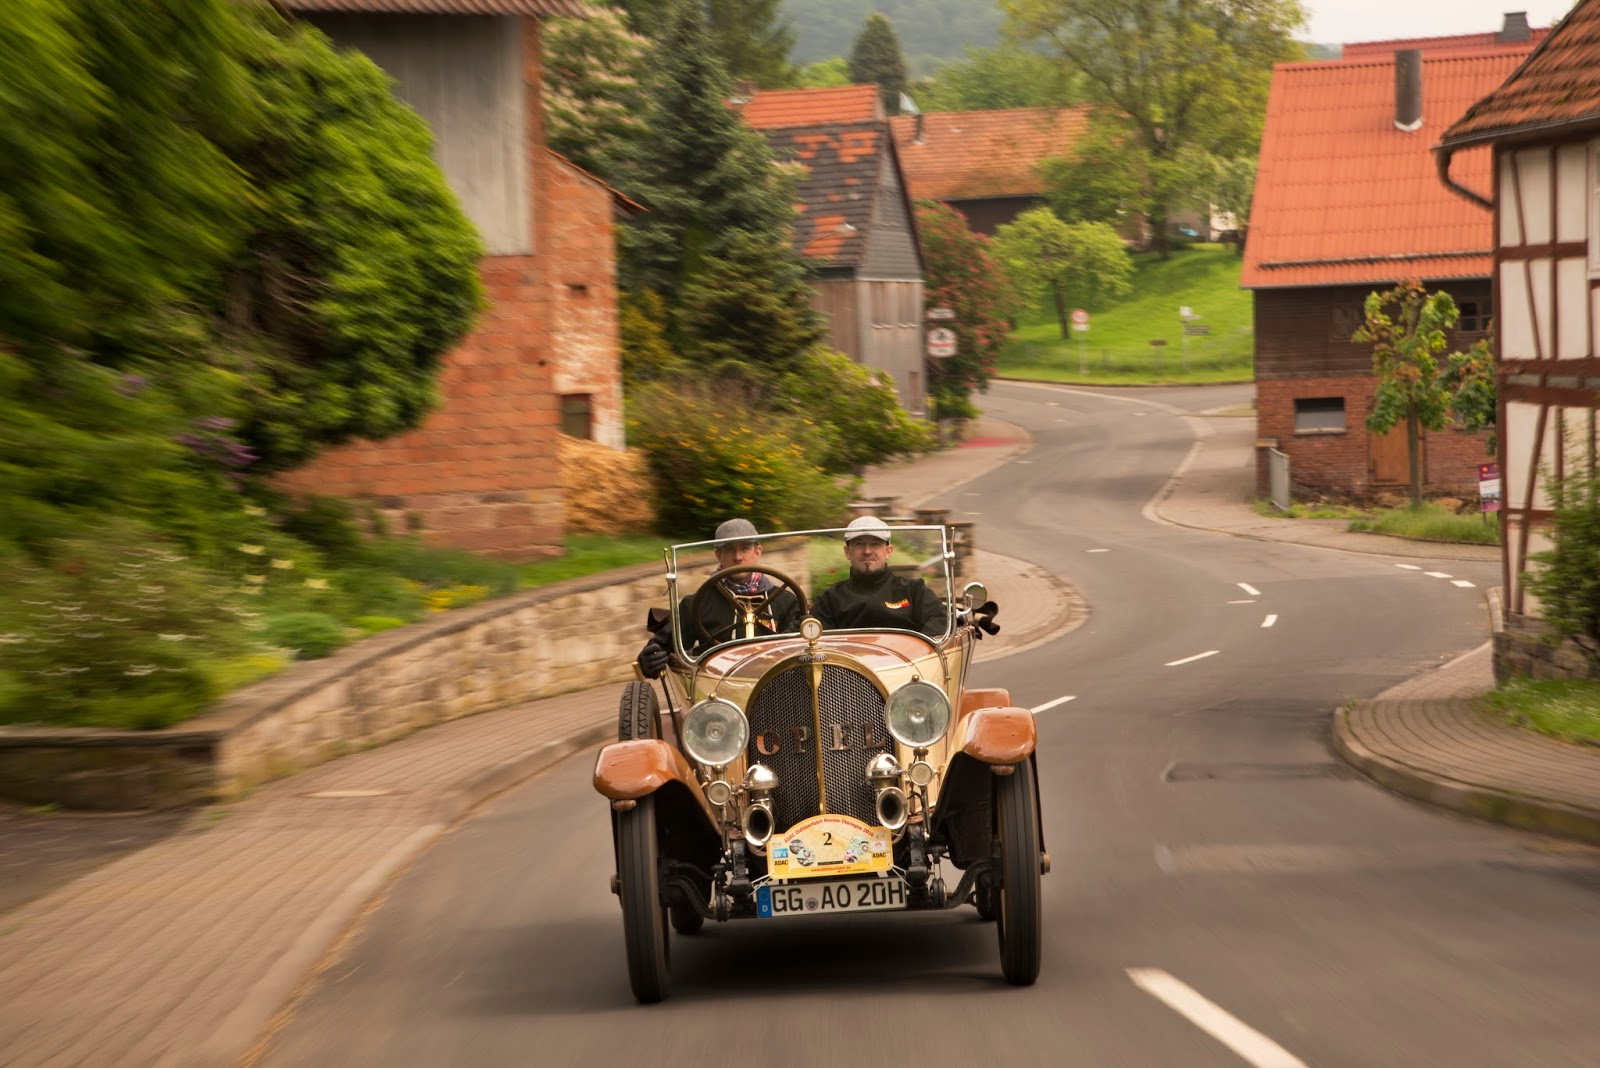 Opel Rallye Hessen Thueringen 2016 Opel 8 25 1920 301186 Ταξίδι στο χρόνο μέσα από την ιστορία 100 χρόνων των Opel Cabrio